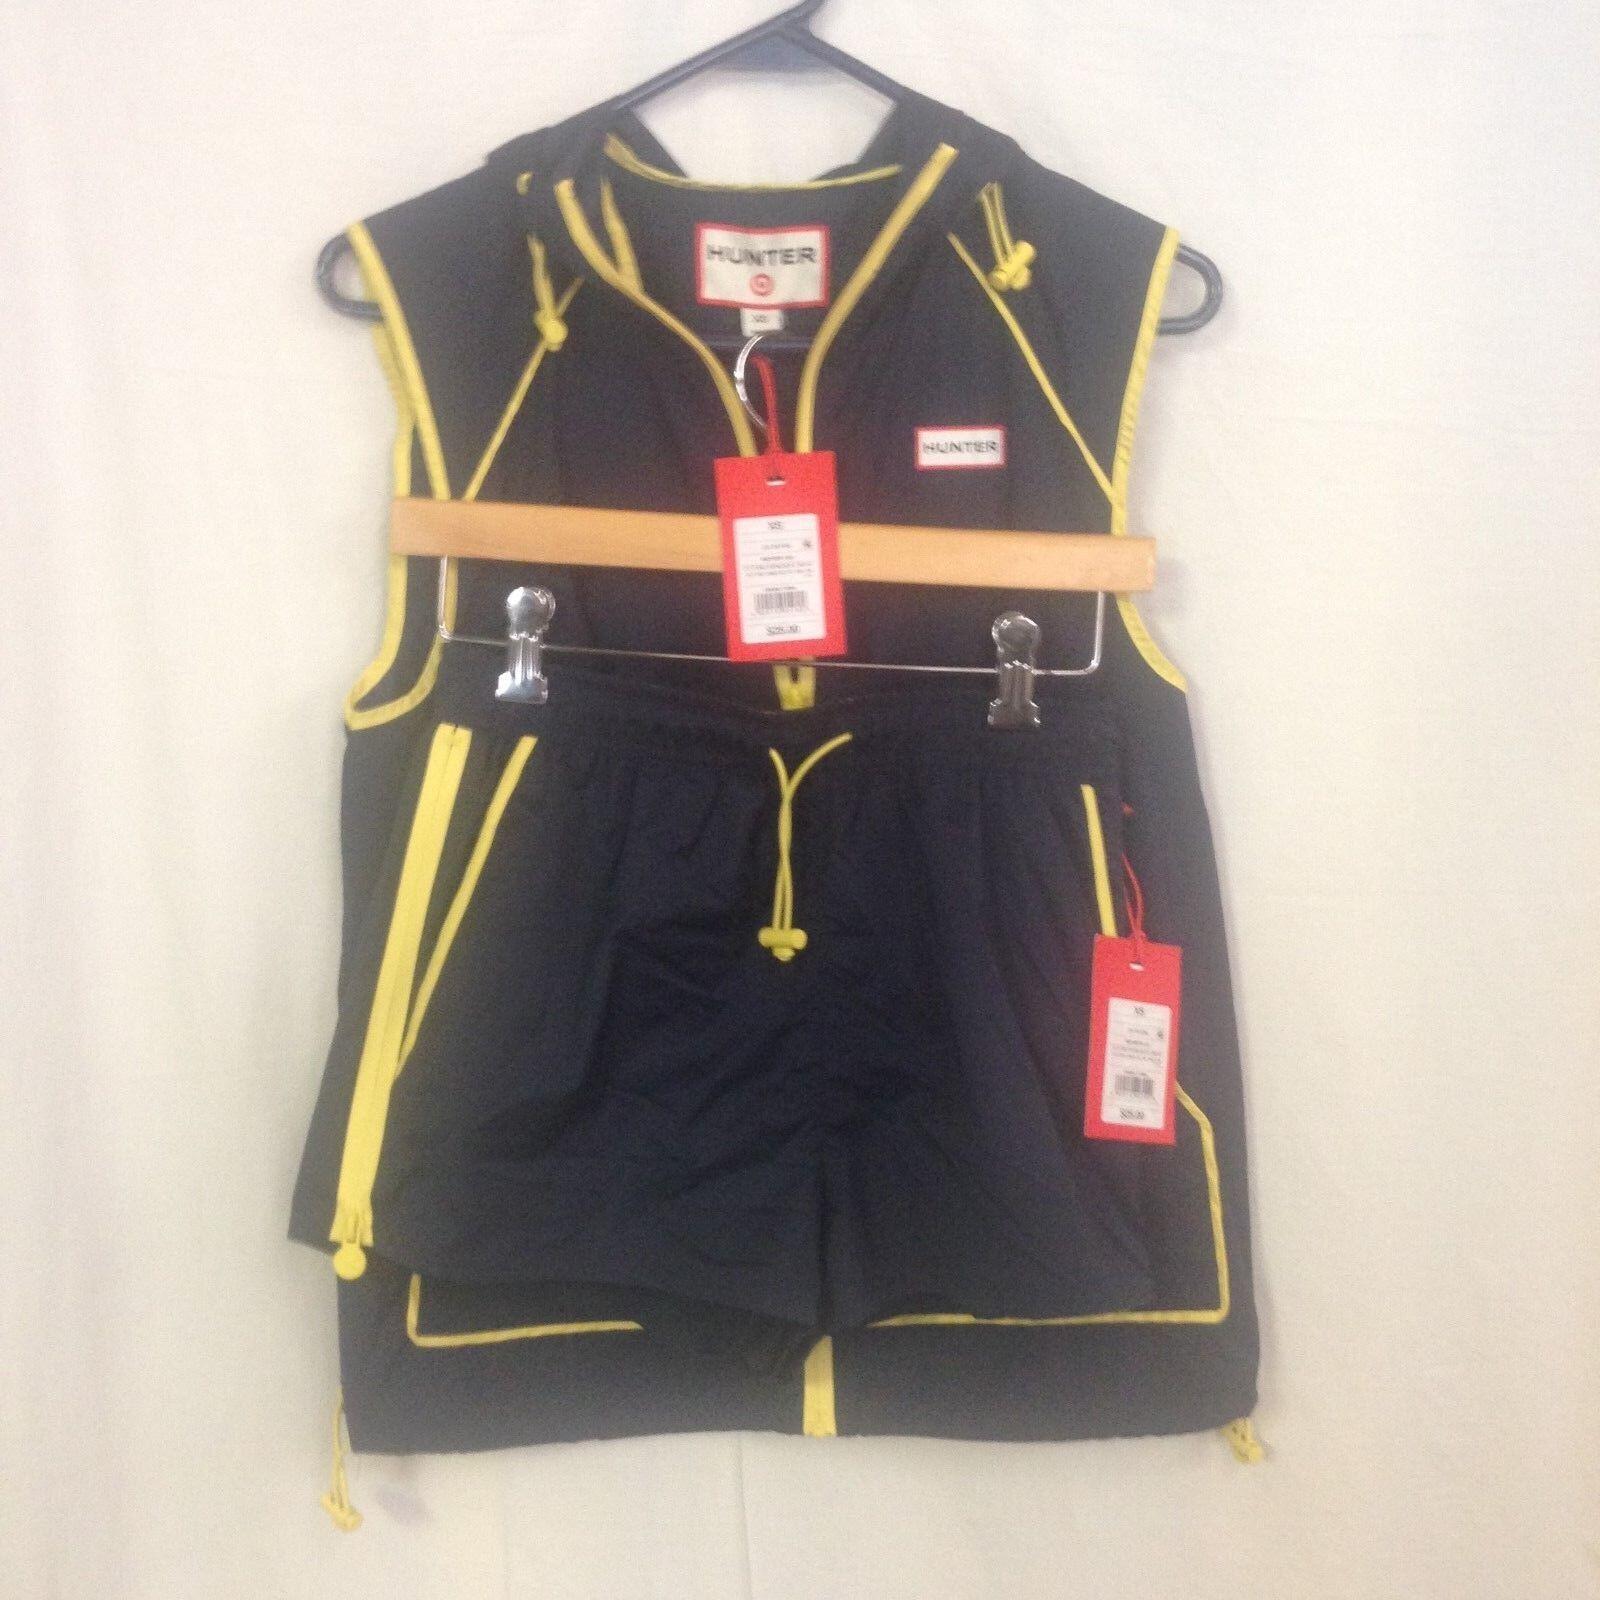 Hunter for Target Women's Hooded Windbreaker Vest and Shorts XL